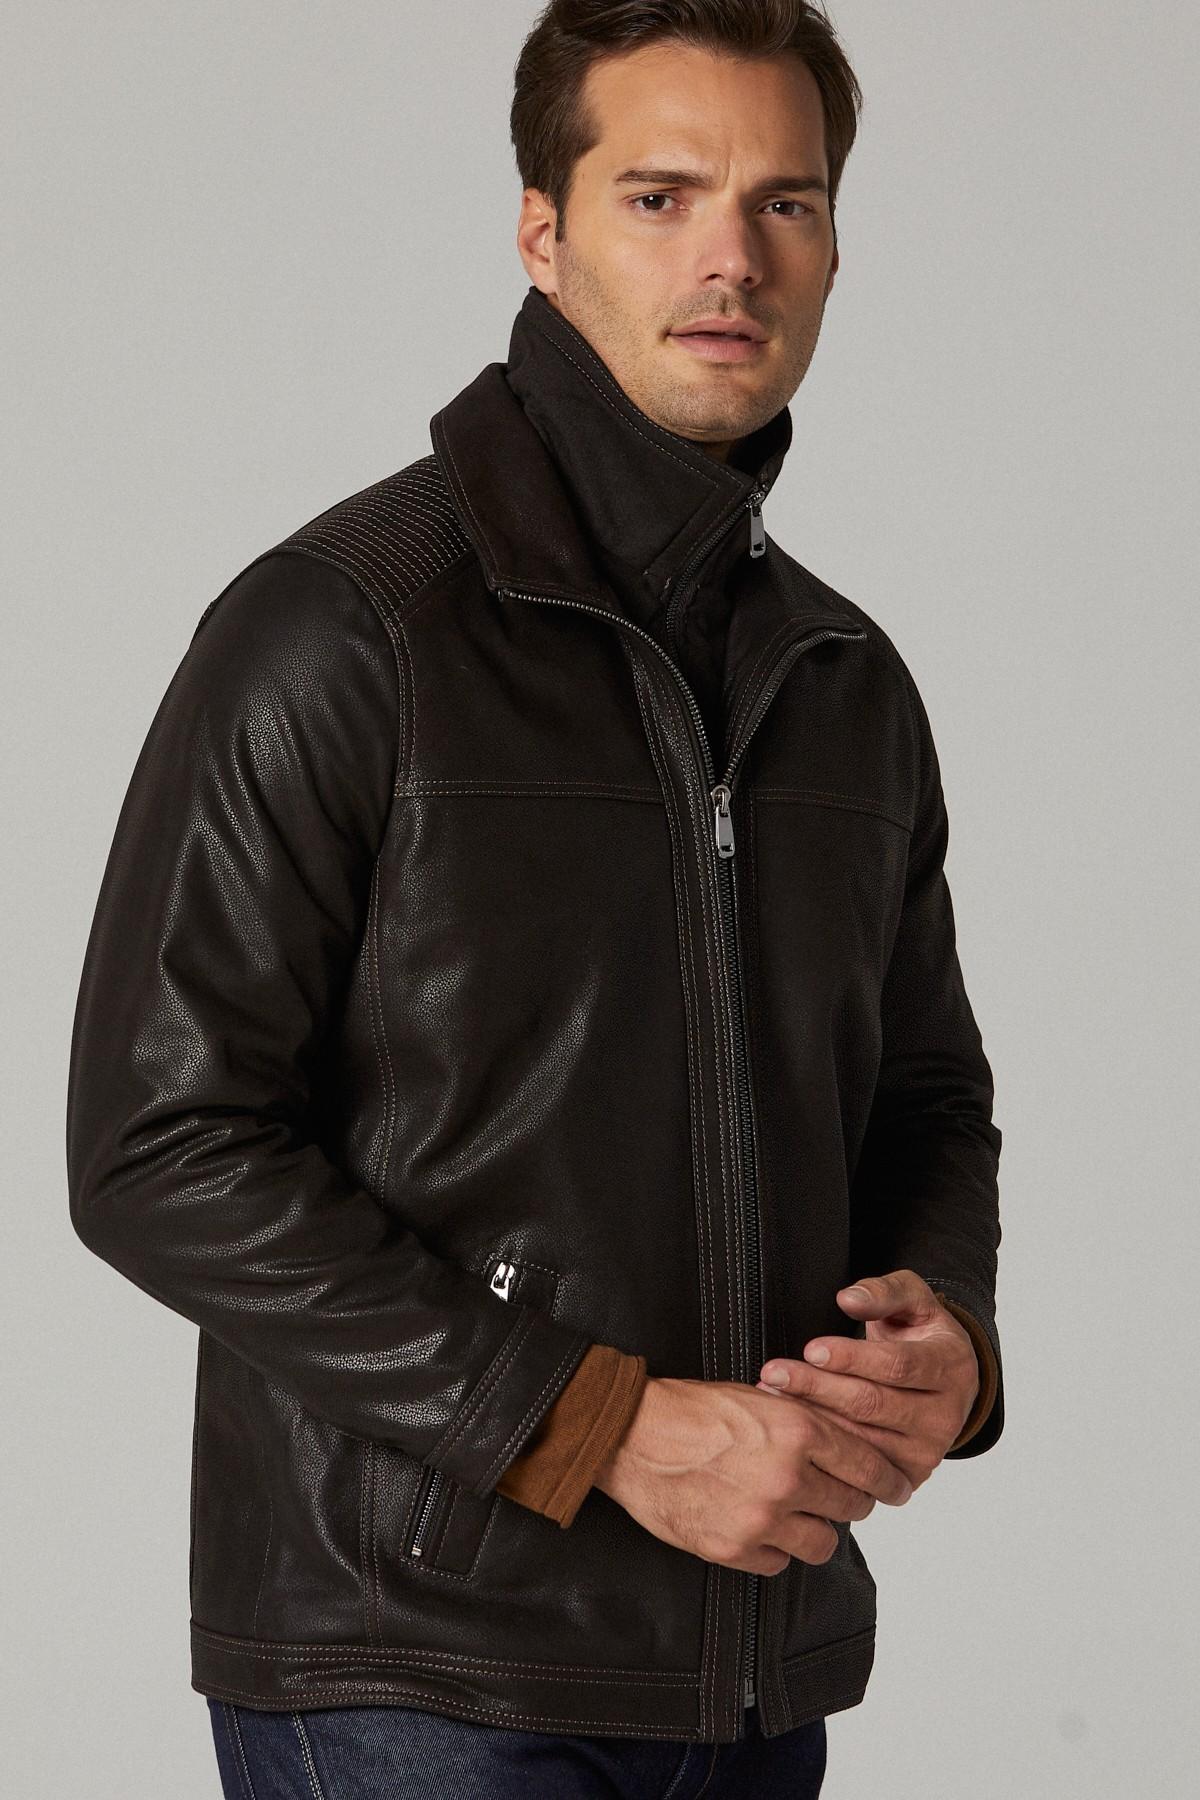 Wilsons Leather Pelle Studio Jacket